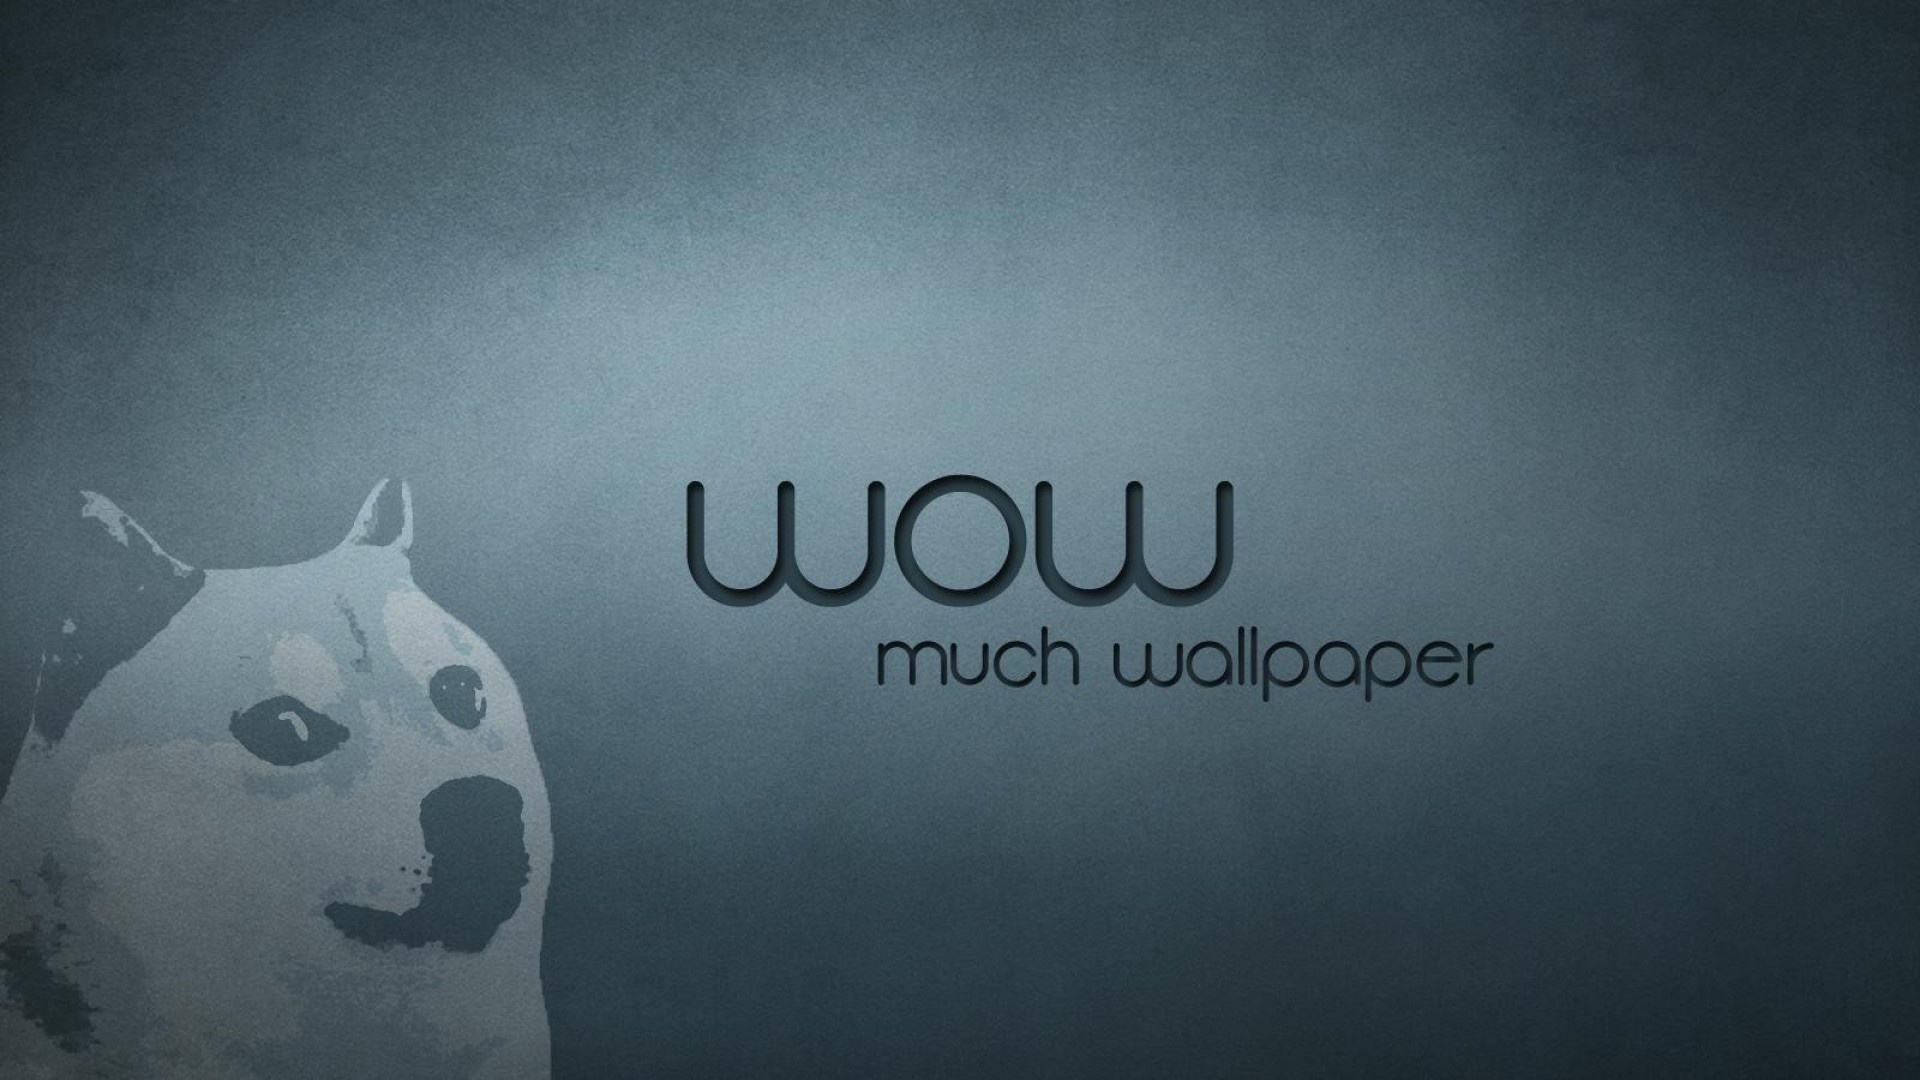 Doge Meme desktop wallpaper